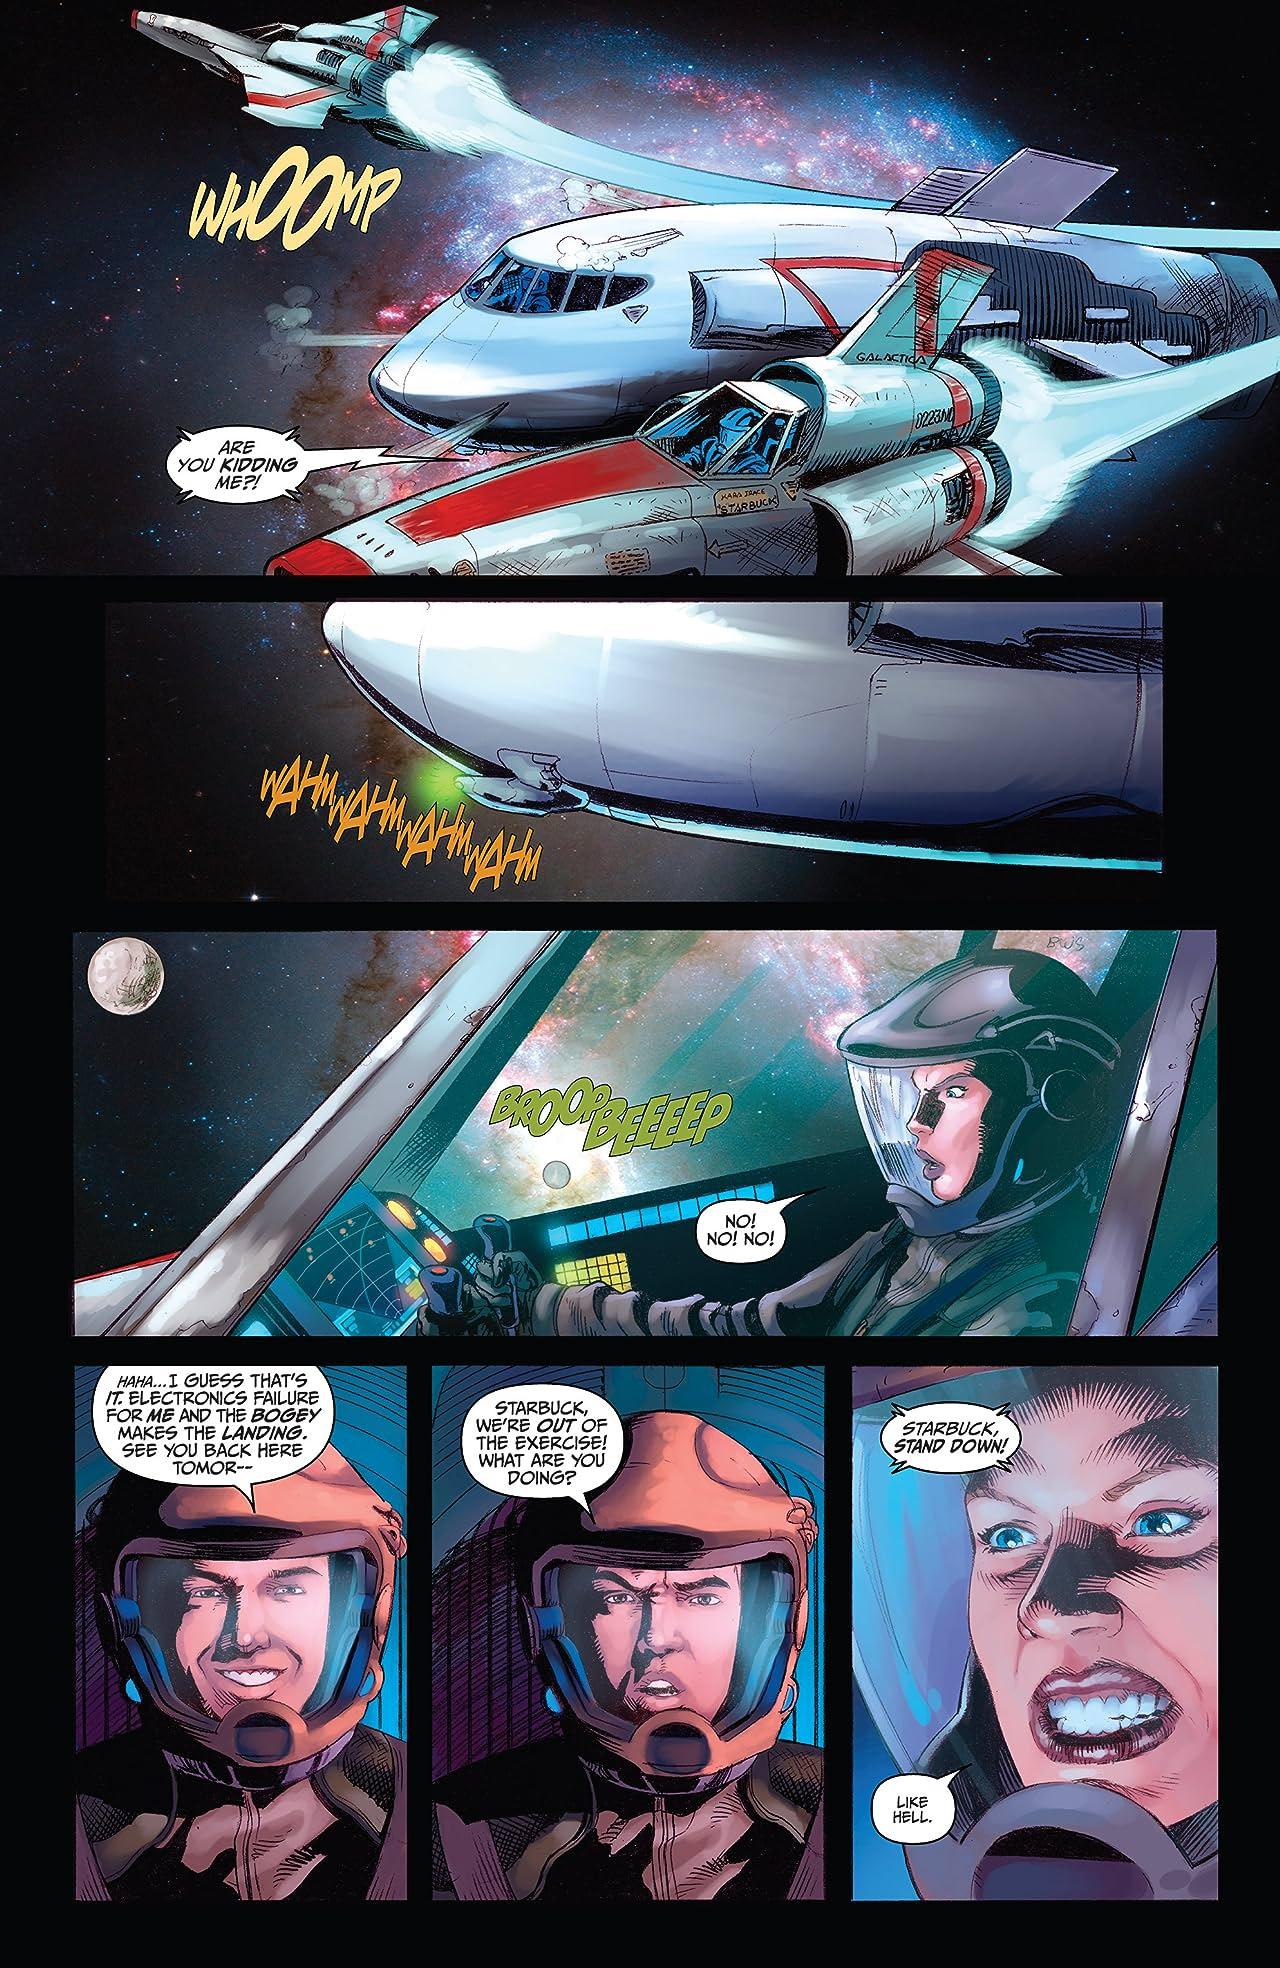 Battlestar Galactica: Season Zero #3